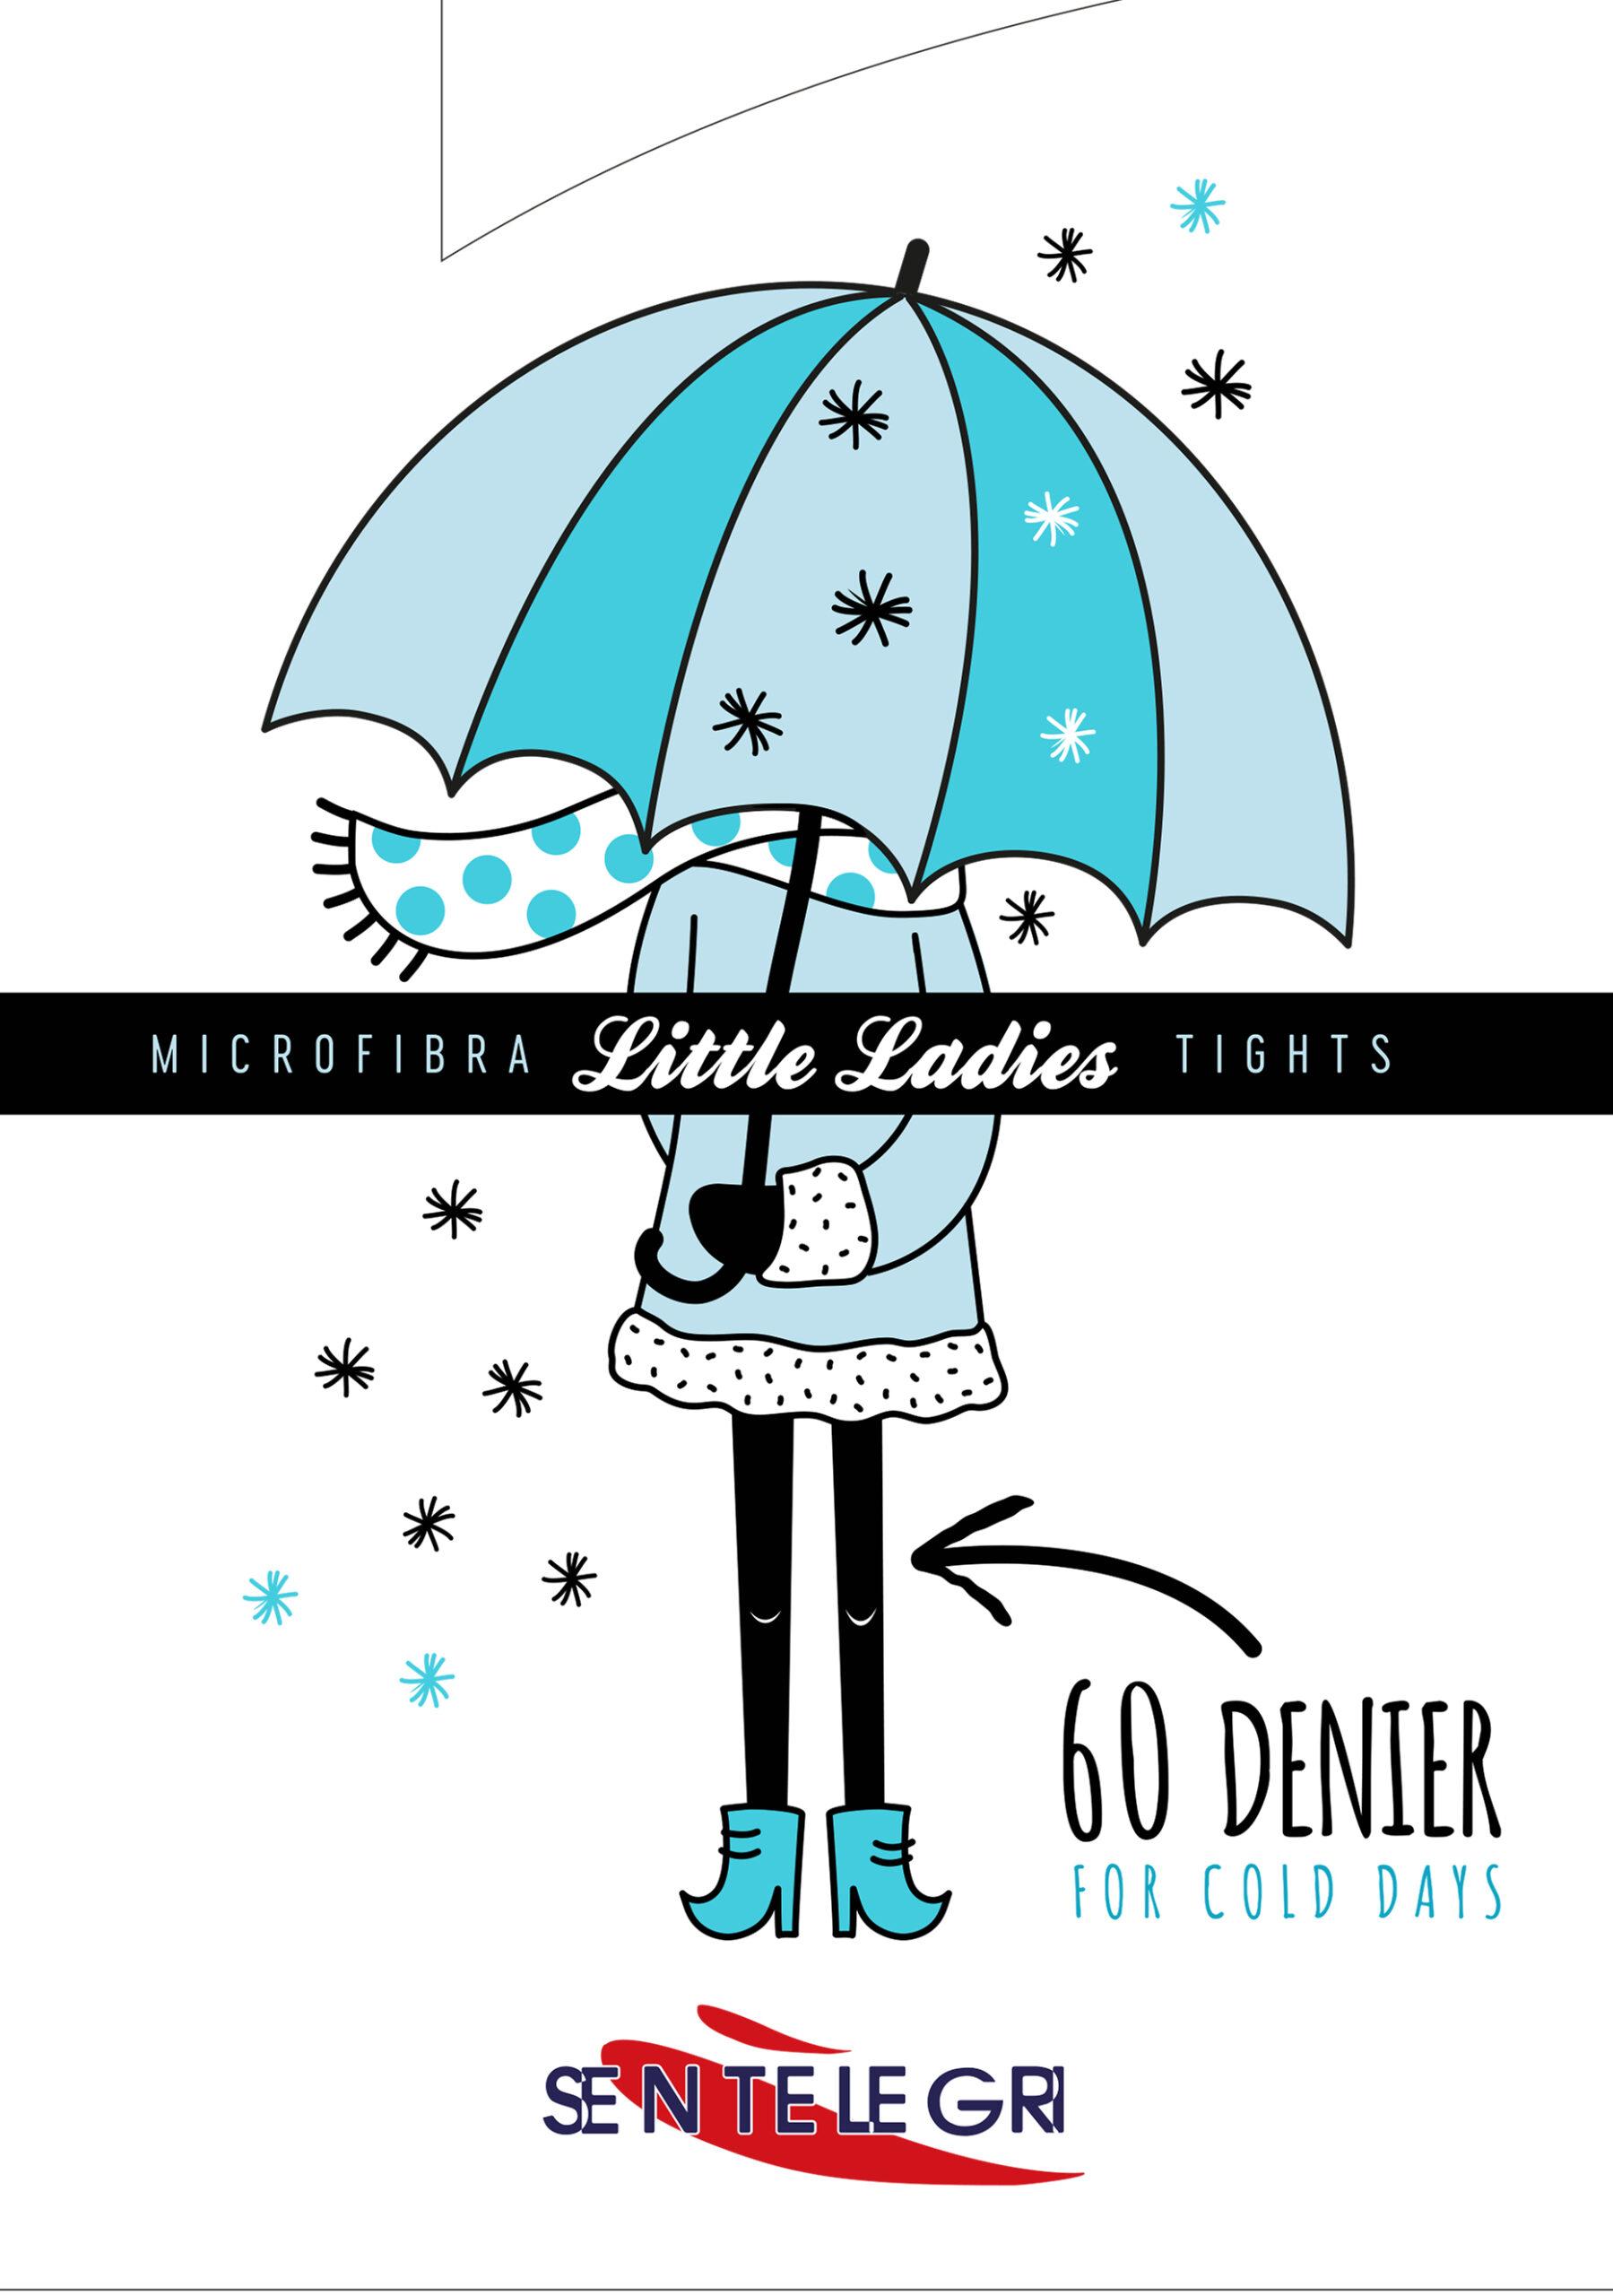 Sentelegri little ladies 60DEN